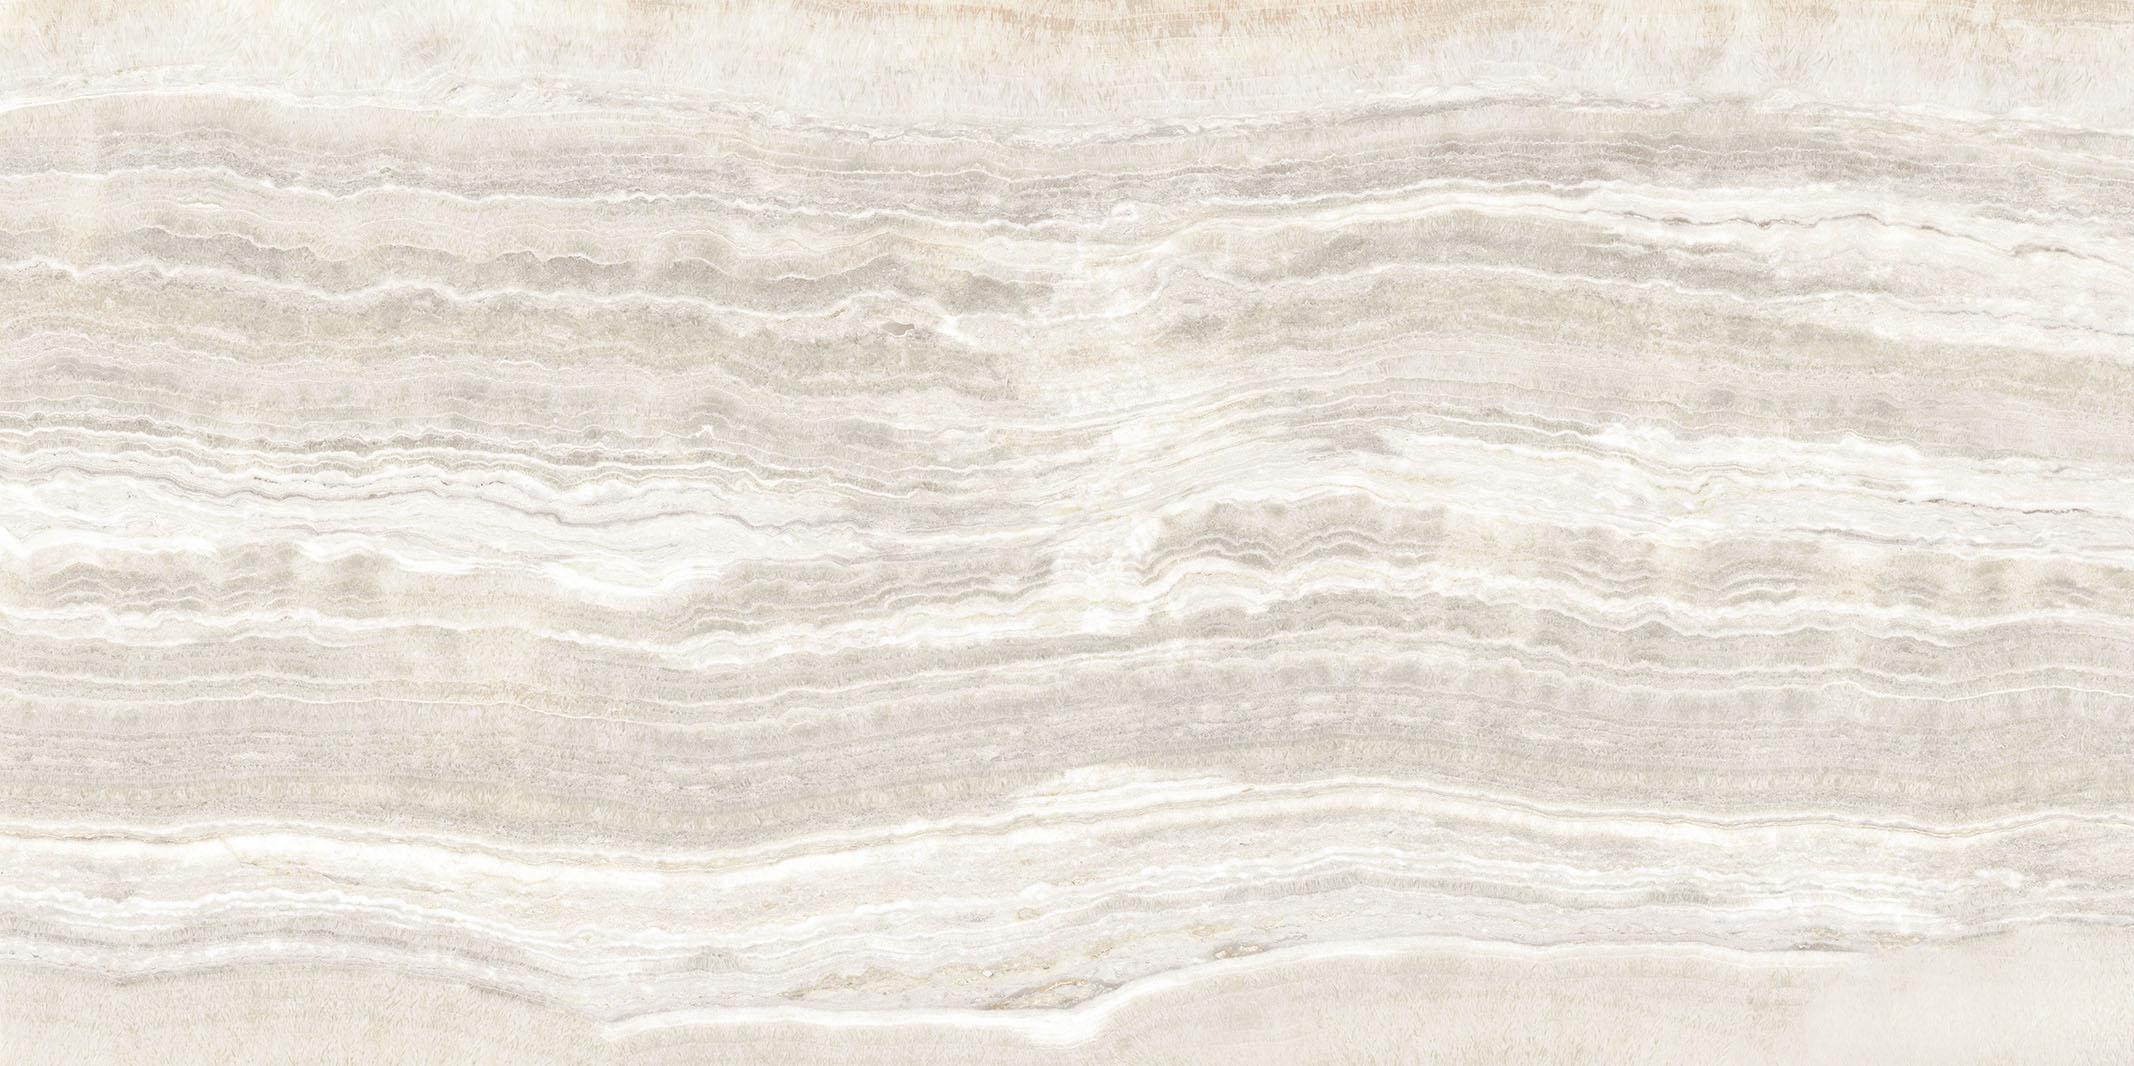 Onyx of Cerim Sand Matte 10mm 30 x 60